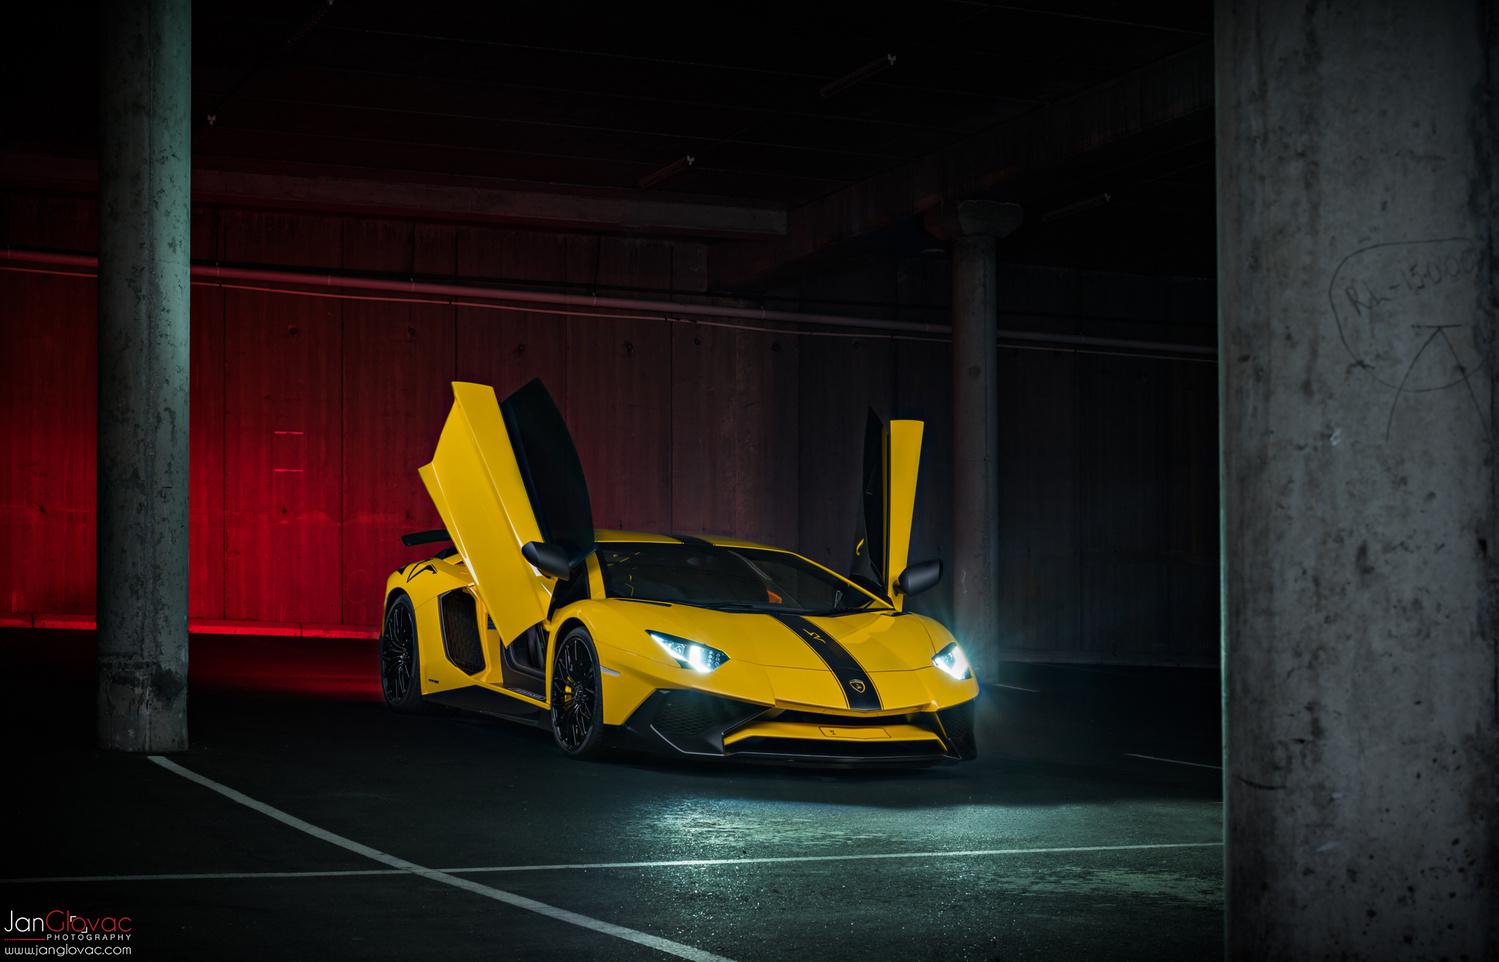 Lamborghini Aventador SV by Jan Glovac